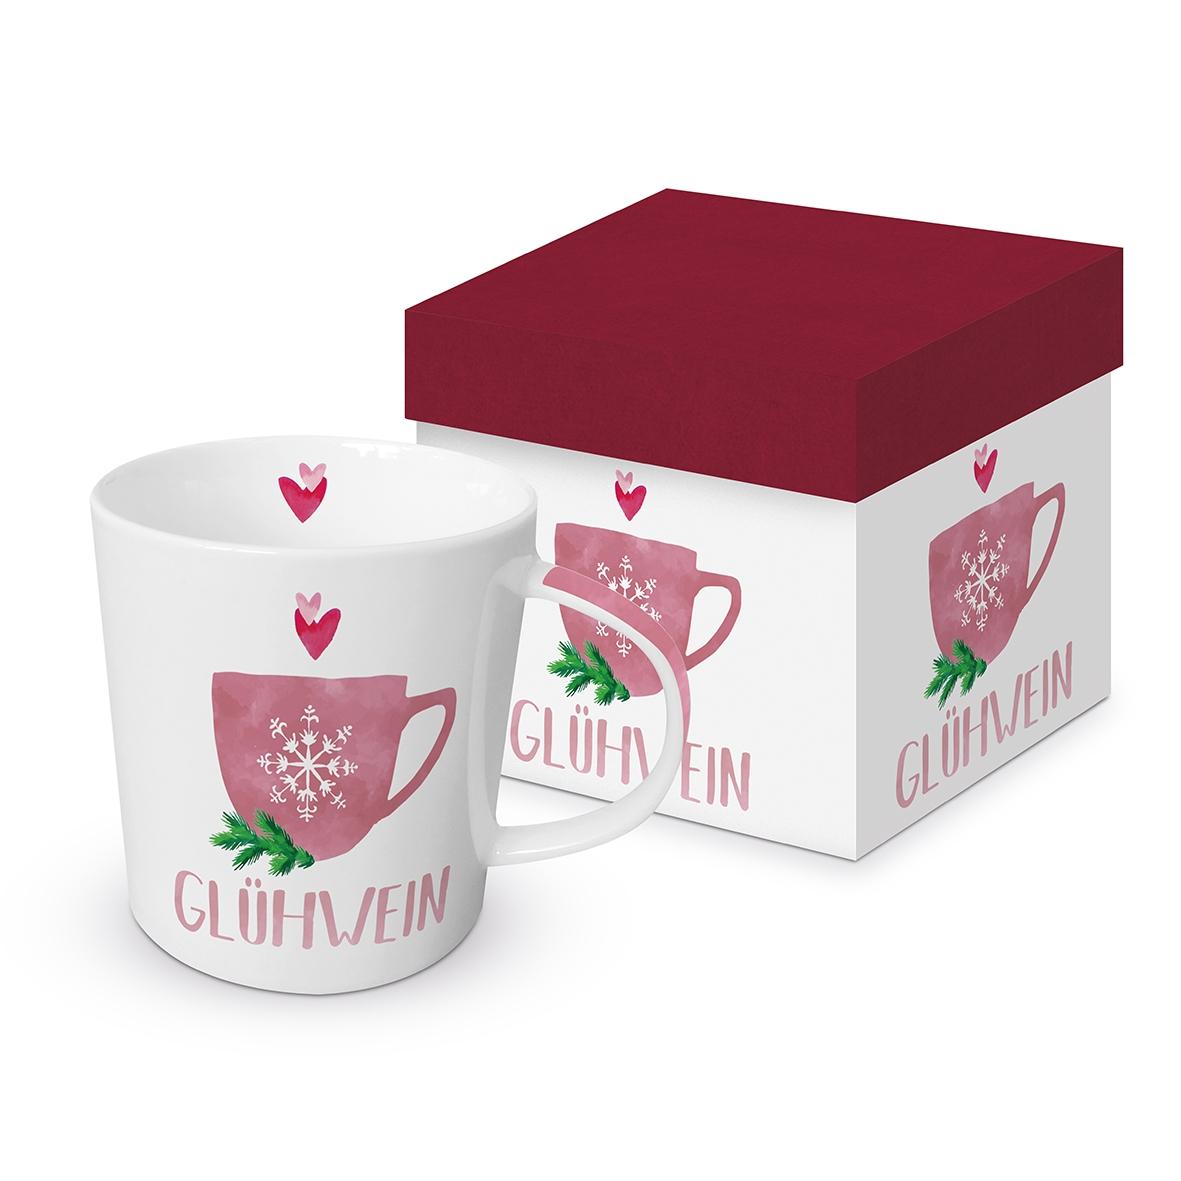 Metal Cup - Glühwein